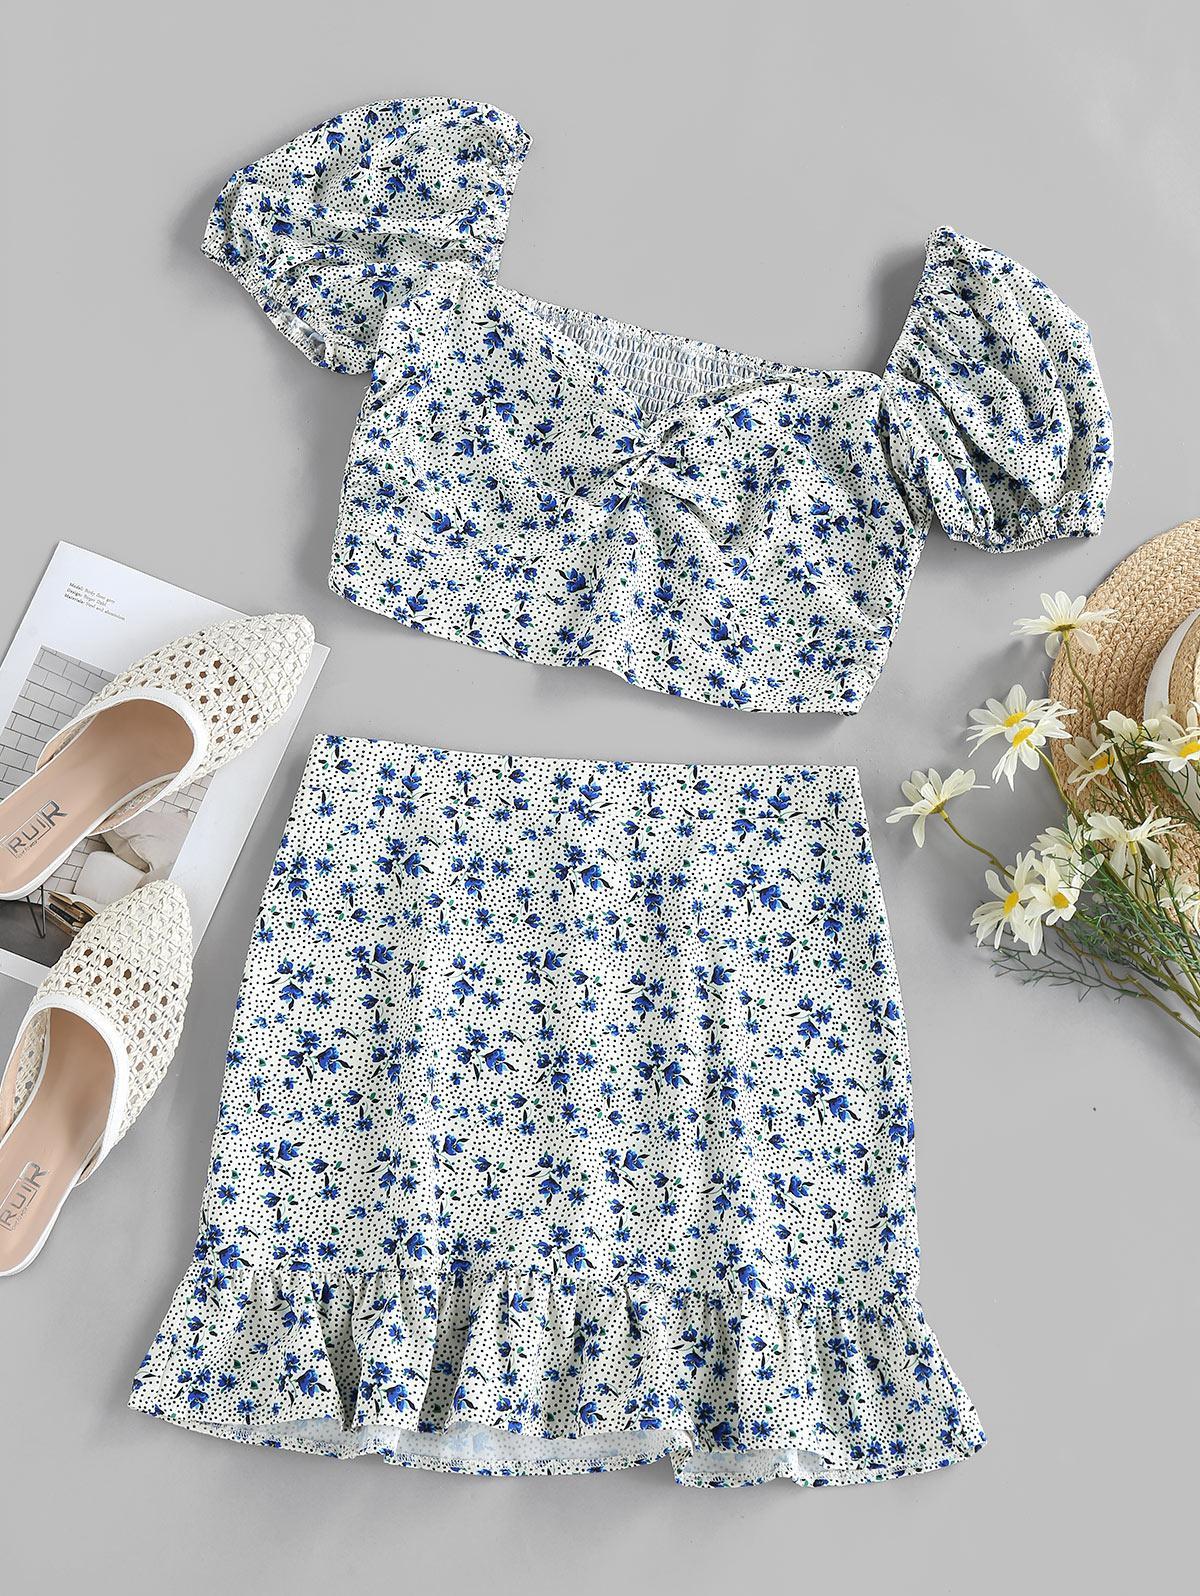 ZAFUL Floral Polka Dot Smocked Twisted Mermaid Skirt Set